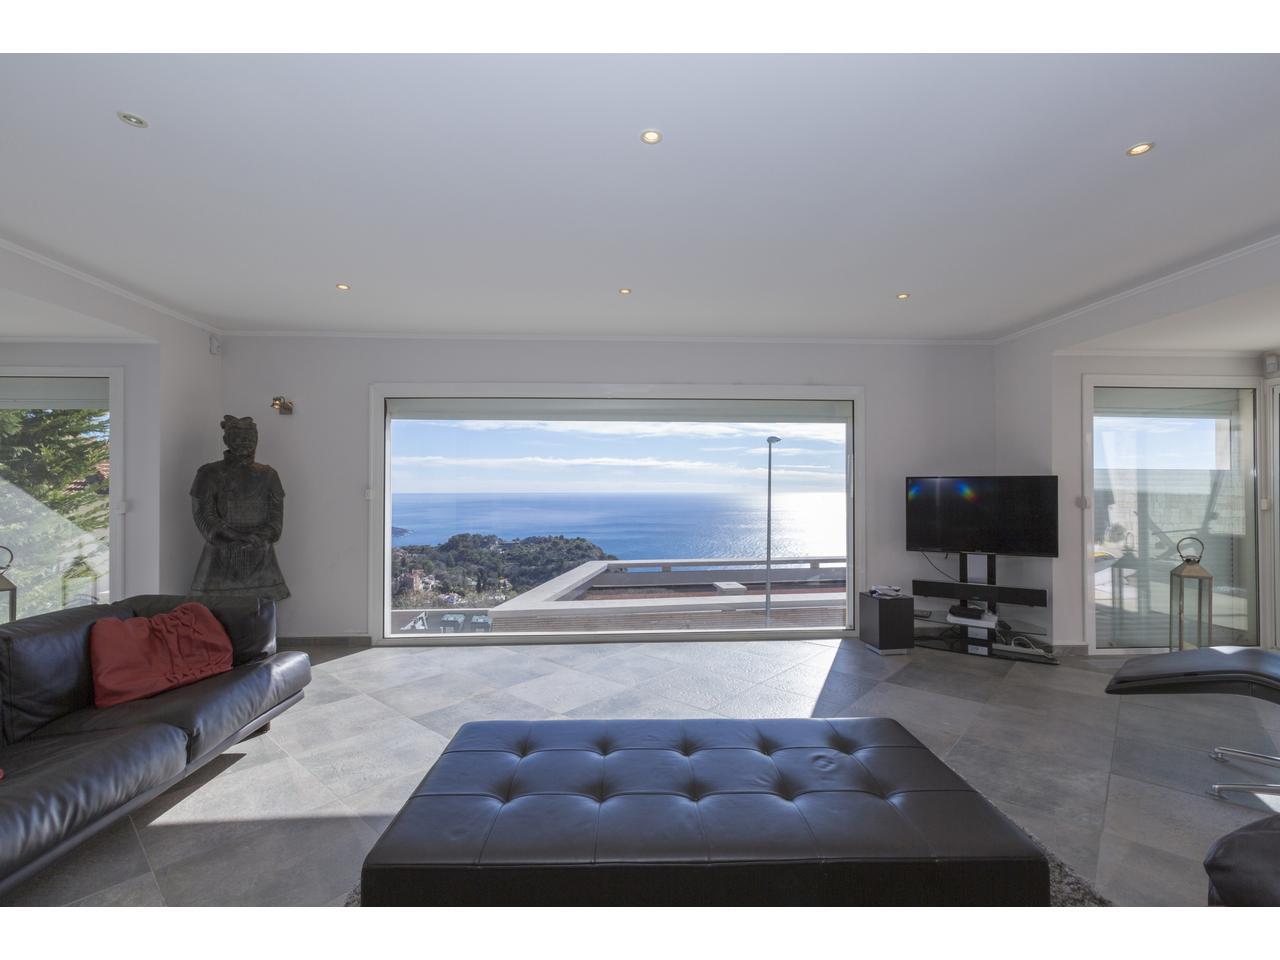 Immobilier nice vue mer Maison La turbie Villa a vendre avec vue mer la turbi -> Roche Bobois A Vendre Nice